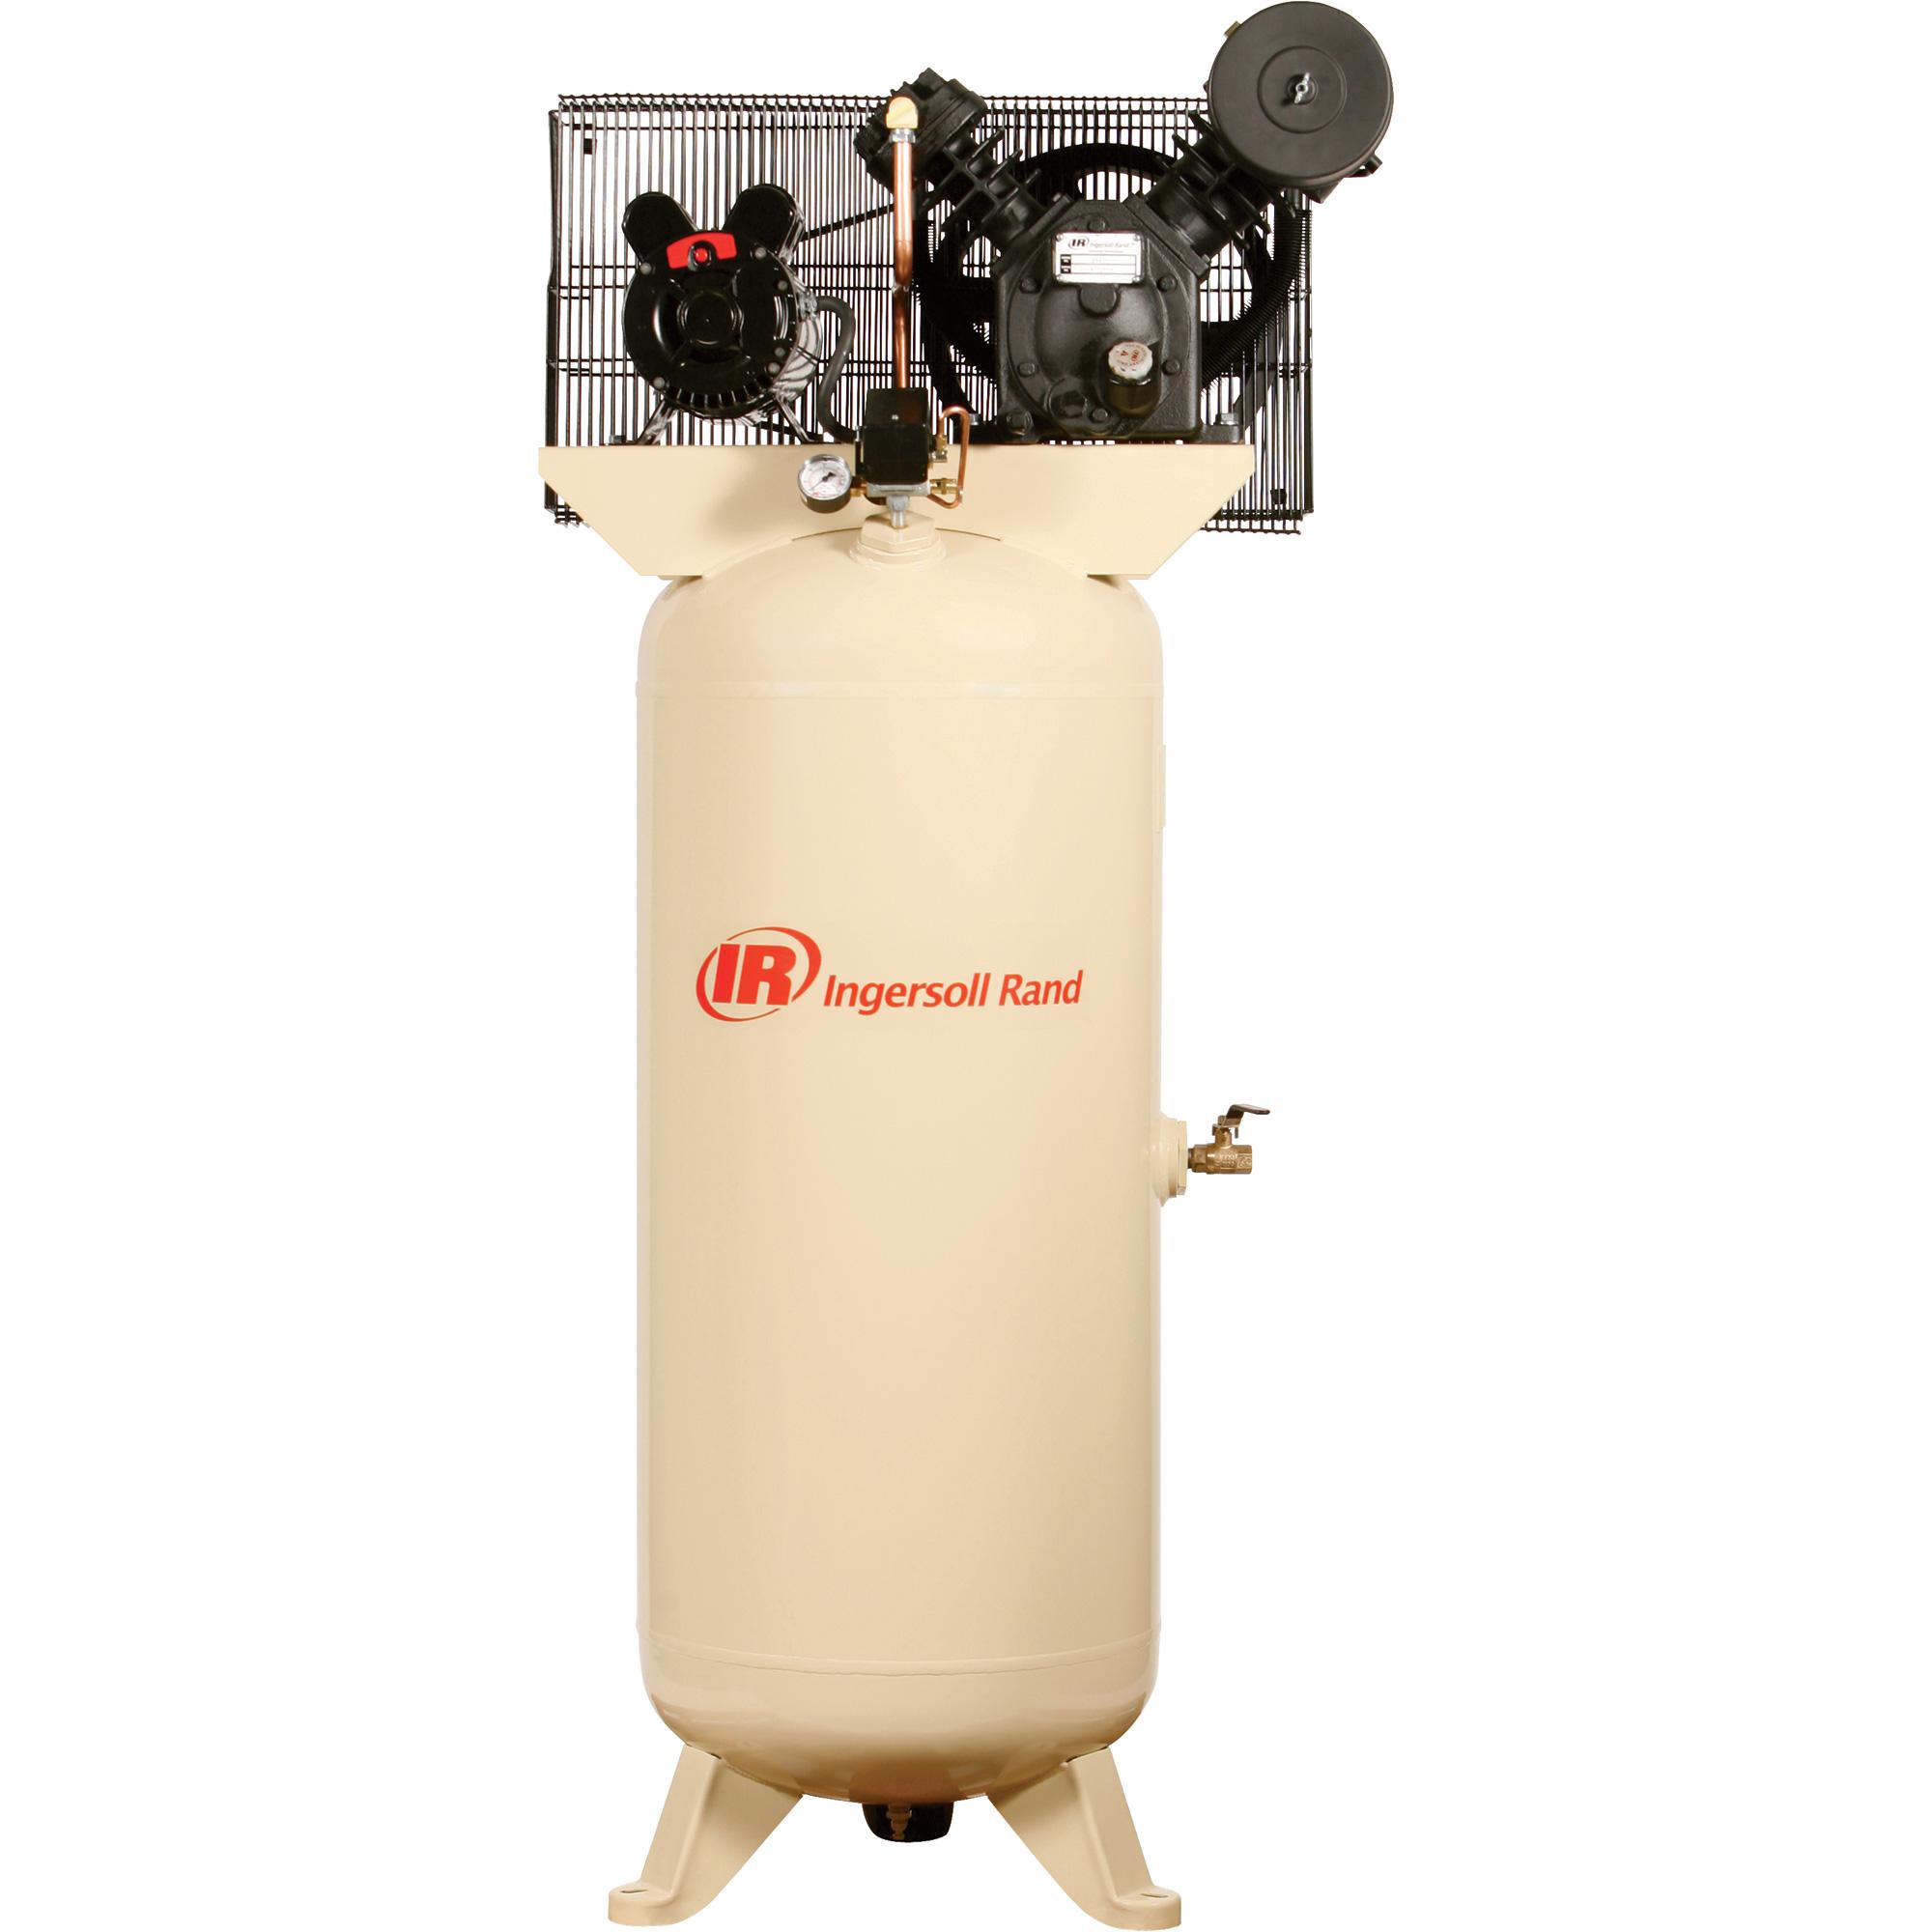 ingersoll rand air compressor 5hp 60gal vert 230v 1-ph 2-stage kit-